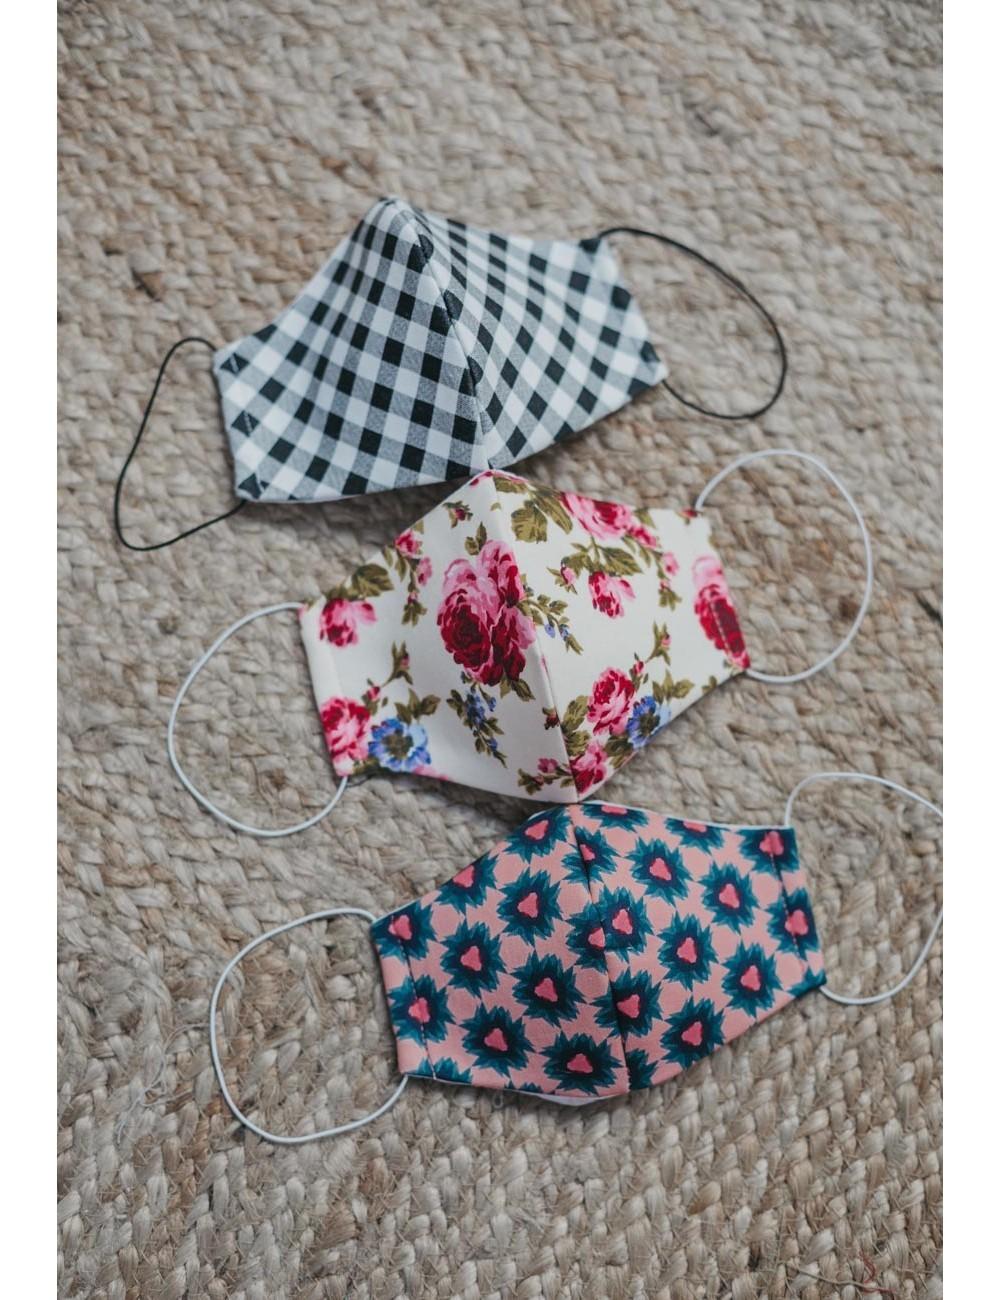 Mascarillas de algodón reutilizables diseñadas por Cherubina. Pack de tres.